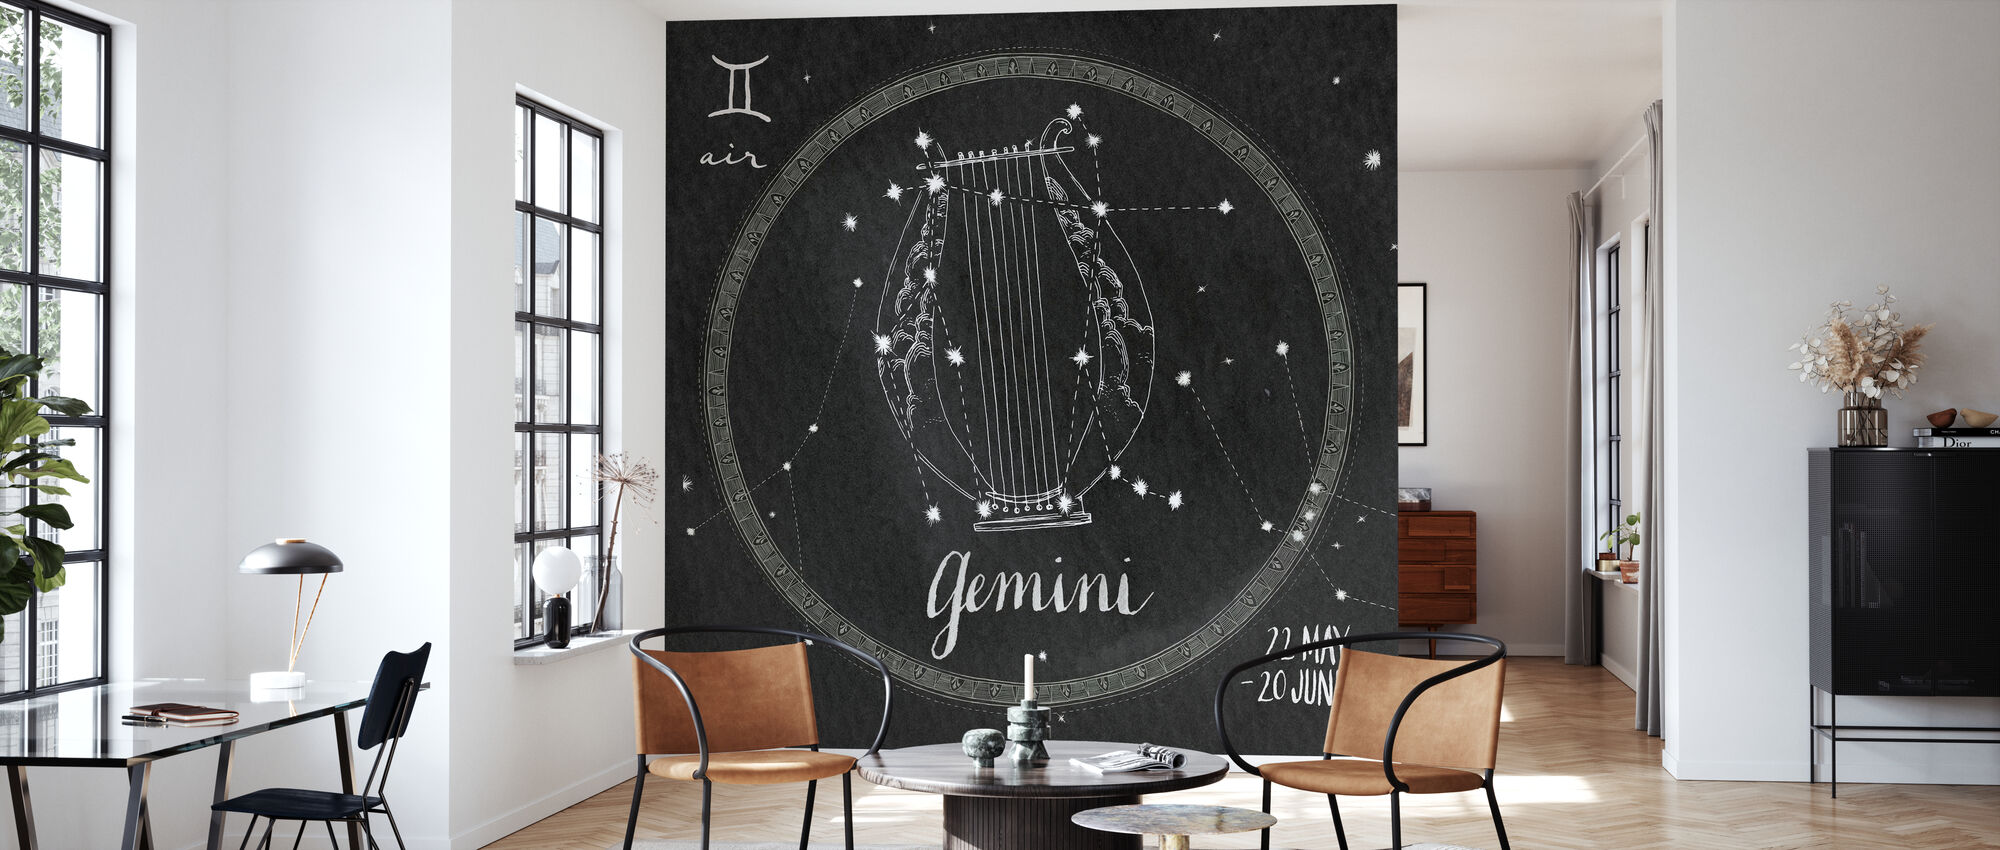 Night Sky Gemini - Wallpaper - Living Room